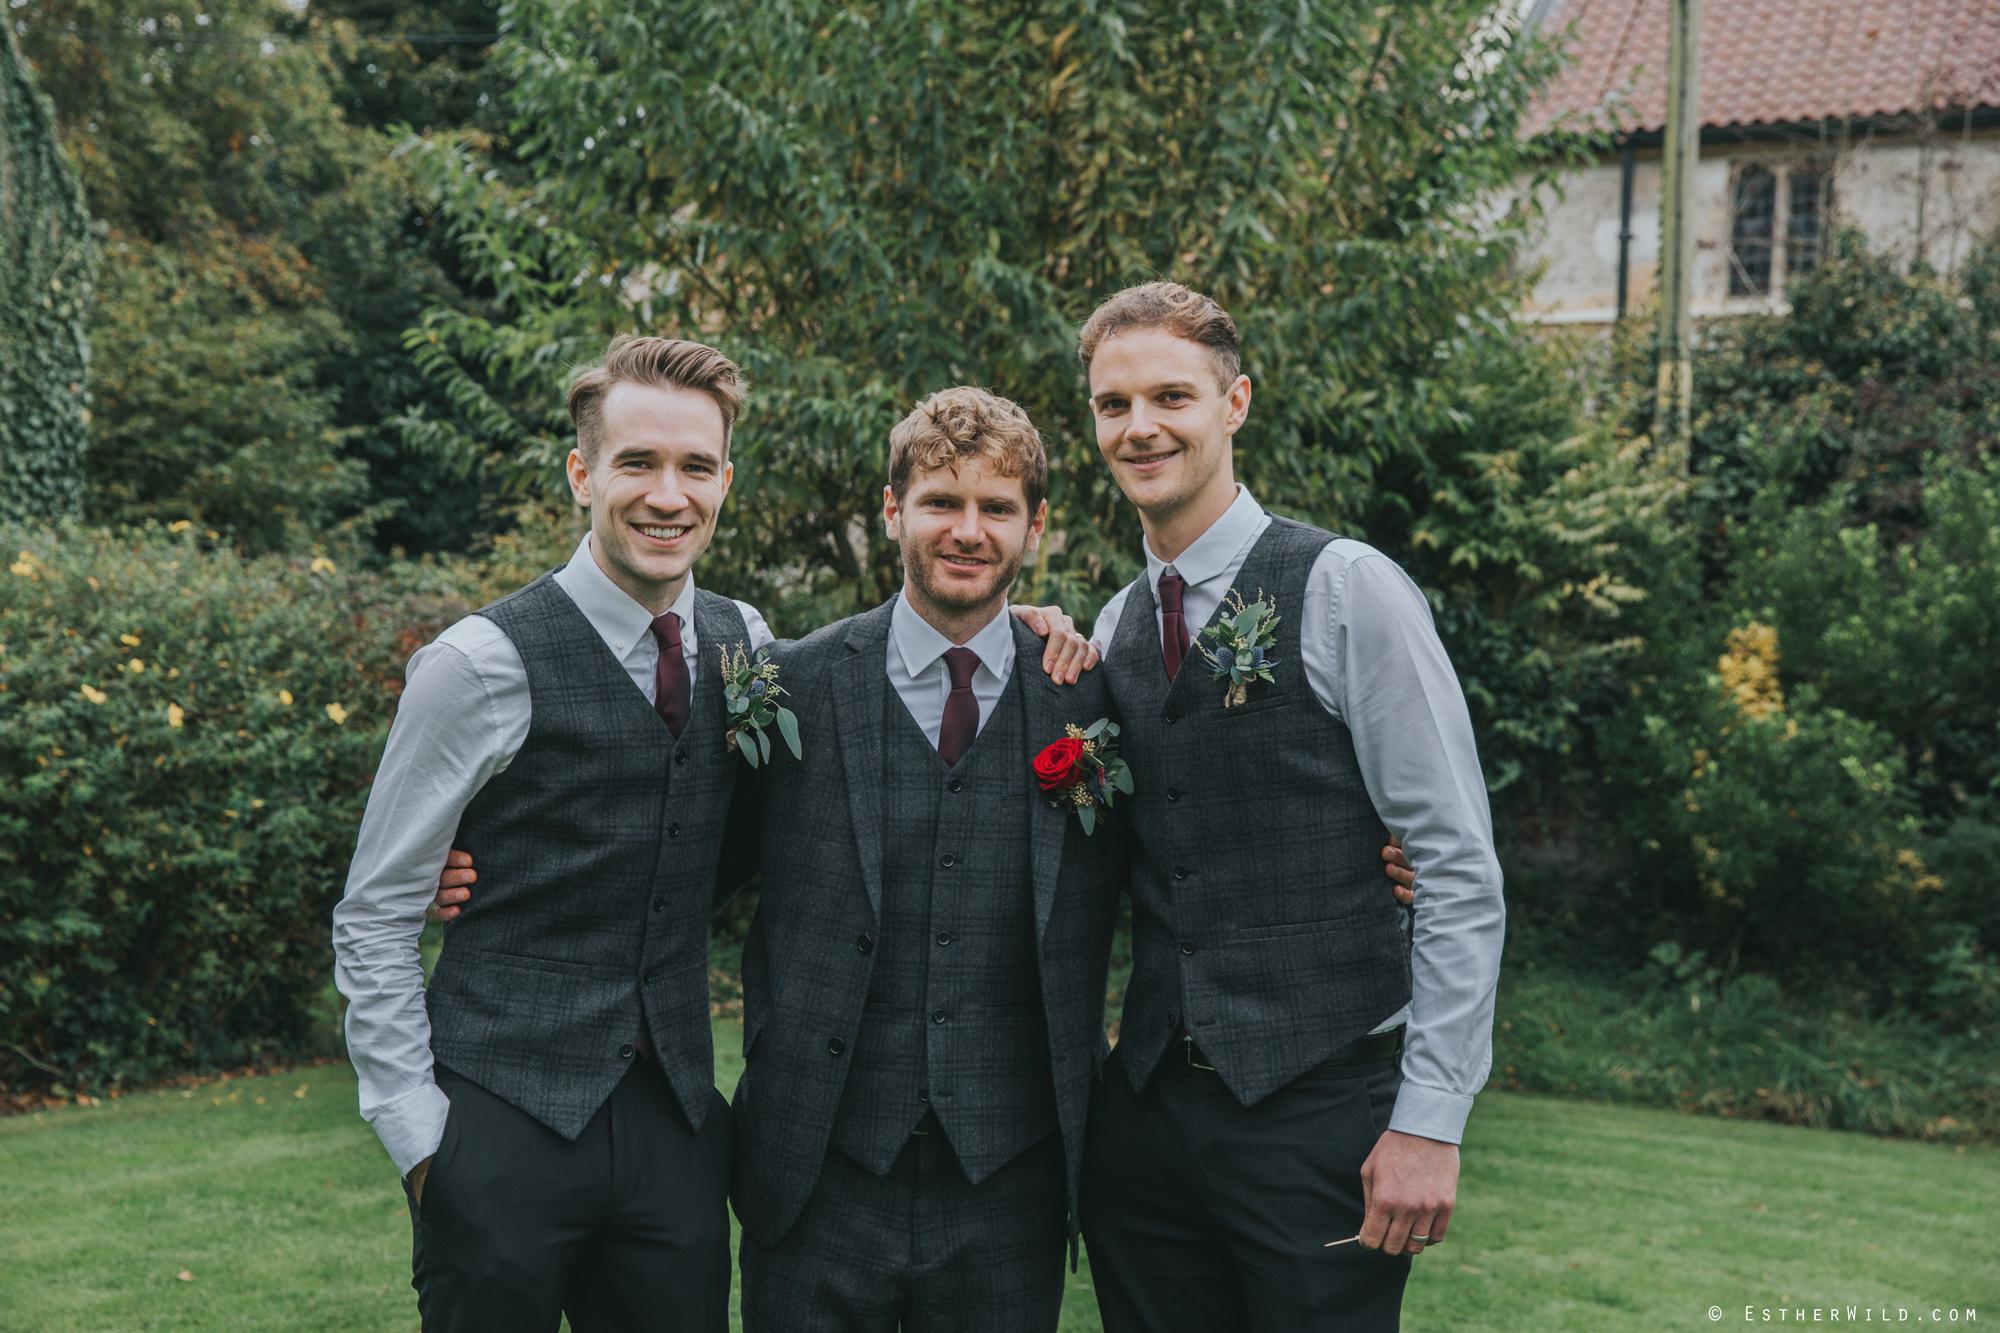 Reading_Room_Weddings_Alby_Norwich_Photographer_Esther_Wild_IMG_1587.jpg